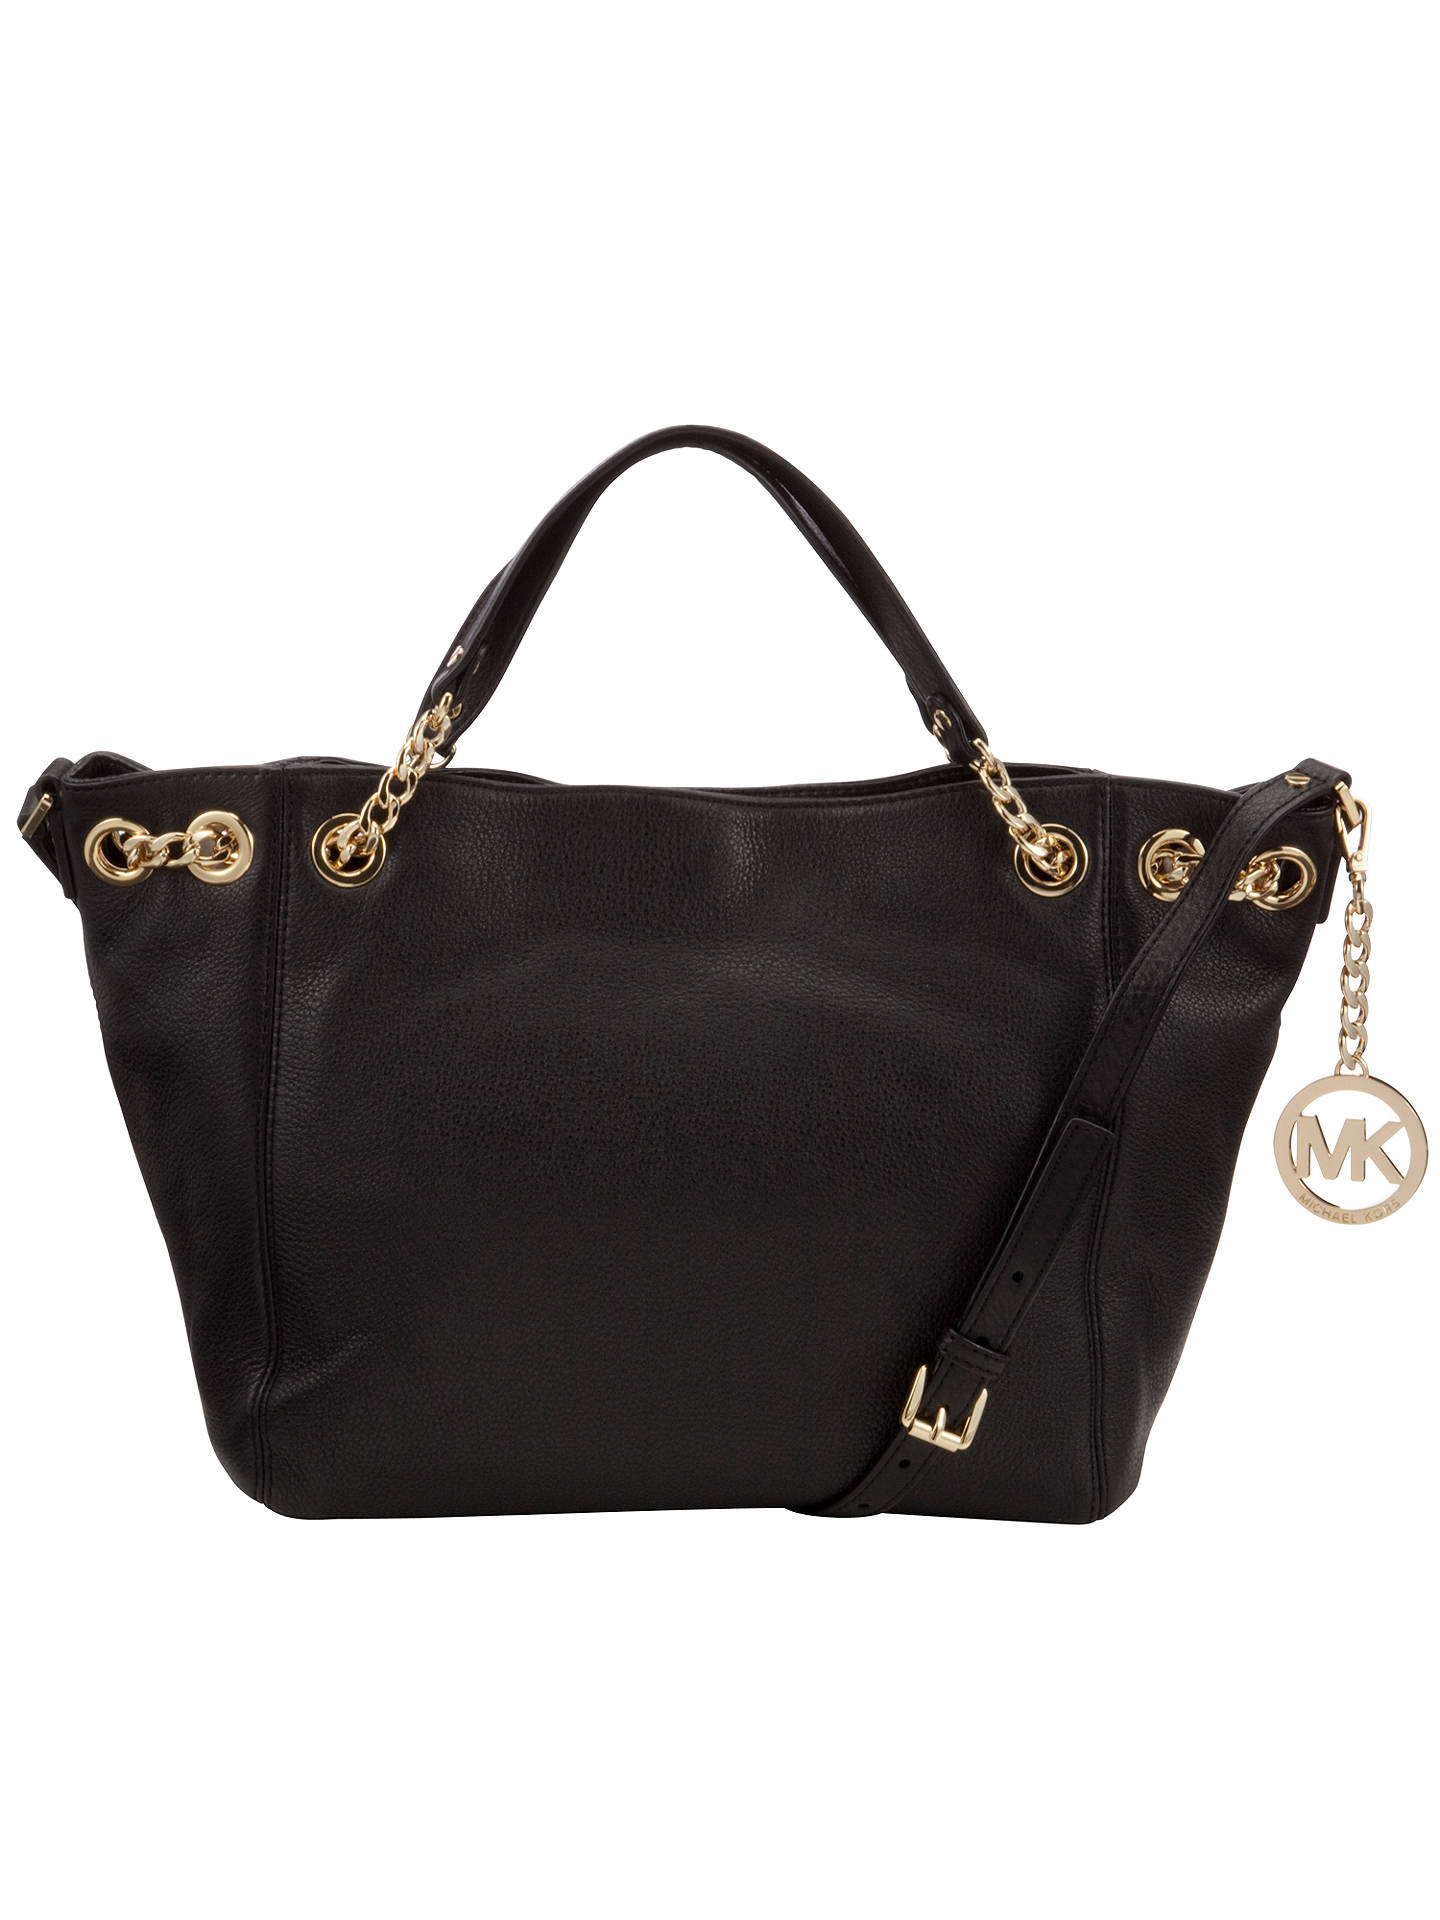 71f6ac69eb2 MICHAEL Michael Kors Jet Set Chain Medium Leather Shoulder Bag at ...